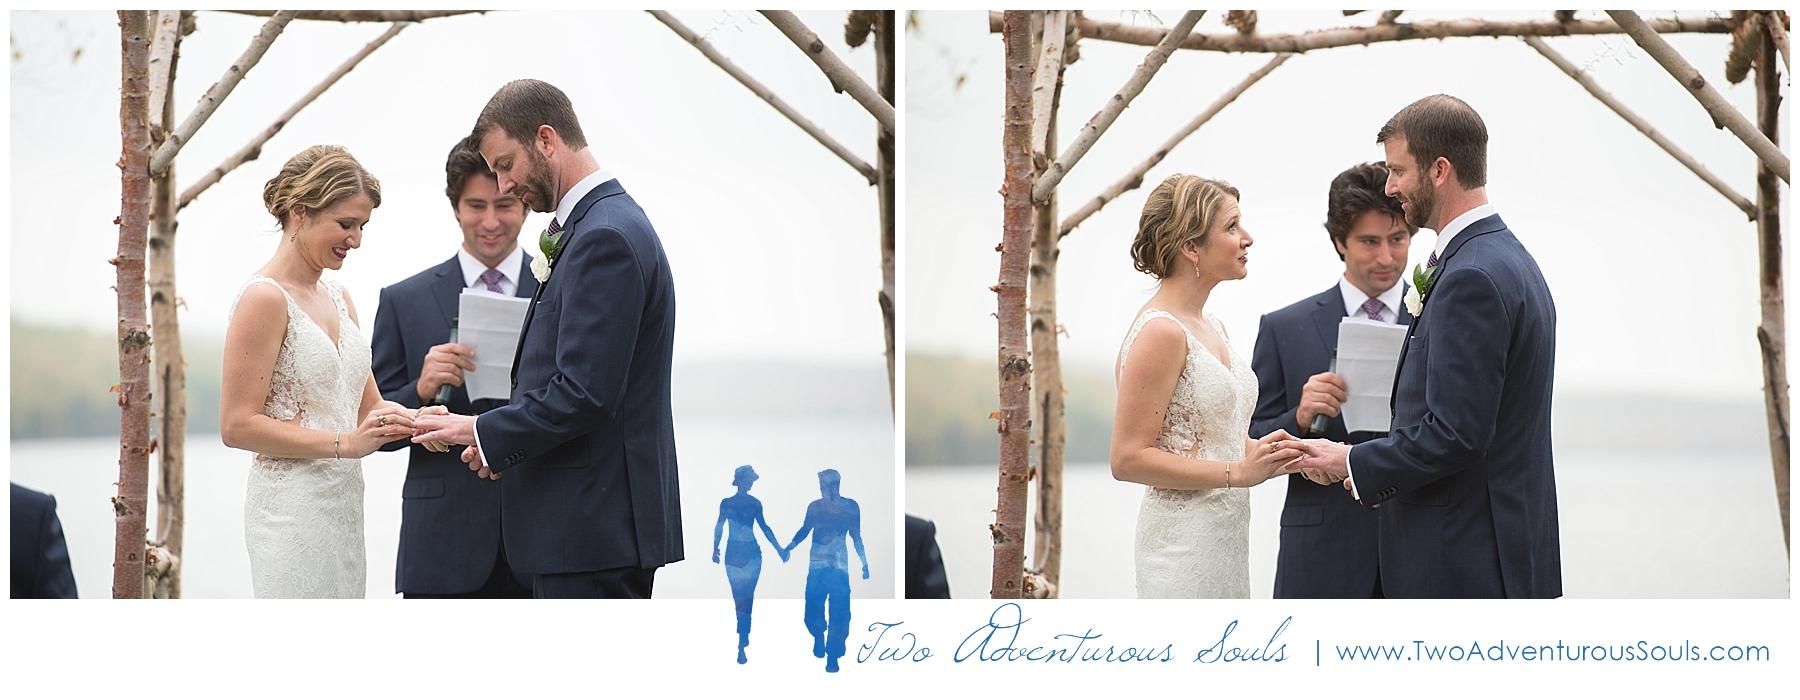 Portland-Headlight-Wedding-Proposal-Photographers-Maine-Wedding-Photographers_0402.jpg